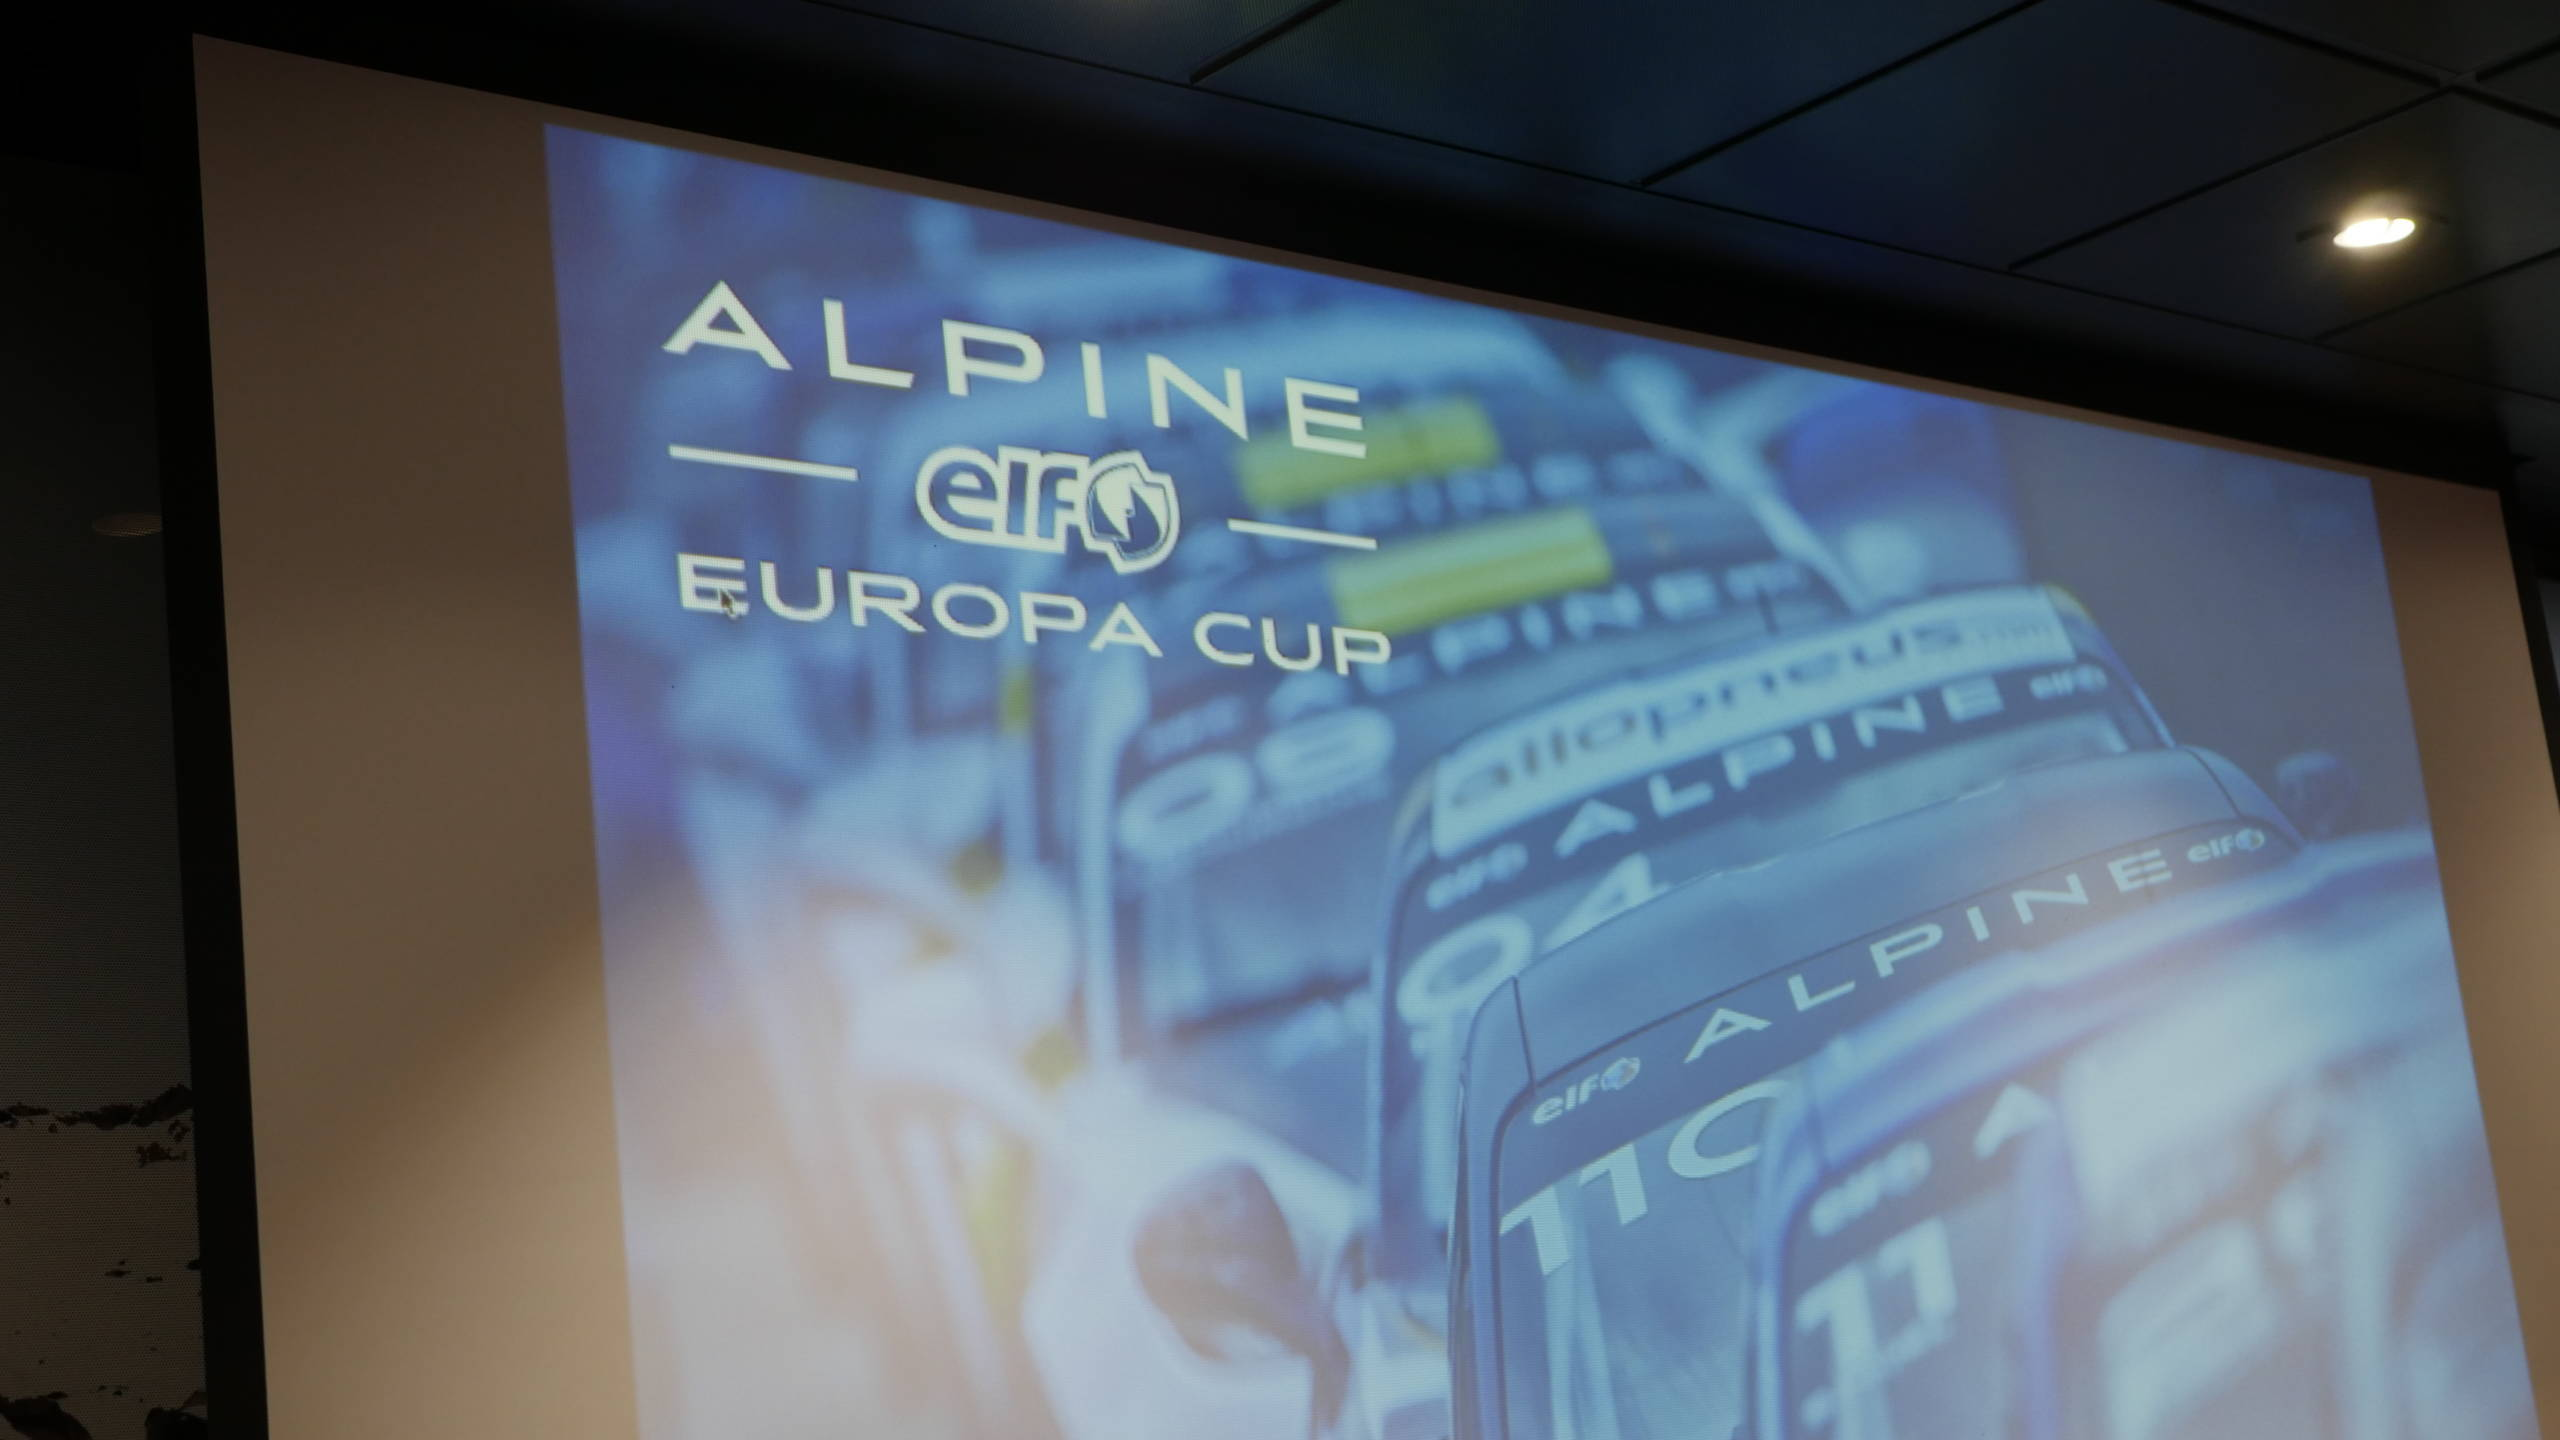 Soirée Alpine Elf Europa Cup 2018 récompense Showroom CMR 18 | Alpine Elf Europa Cup: par ici le programme 2019 !